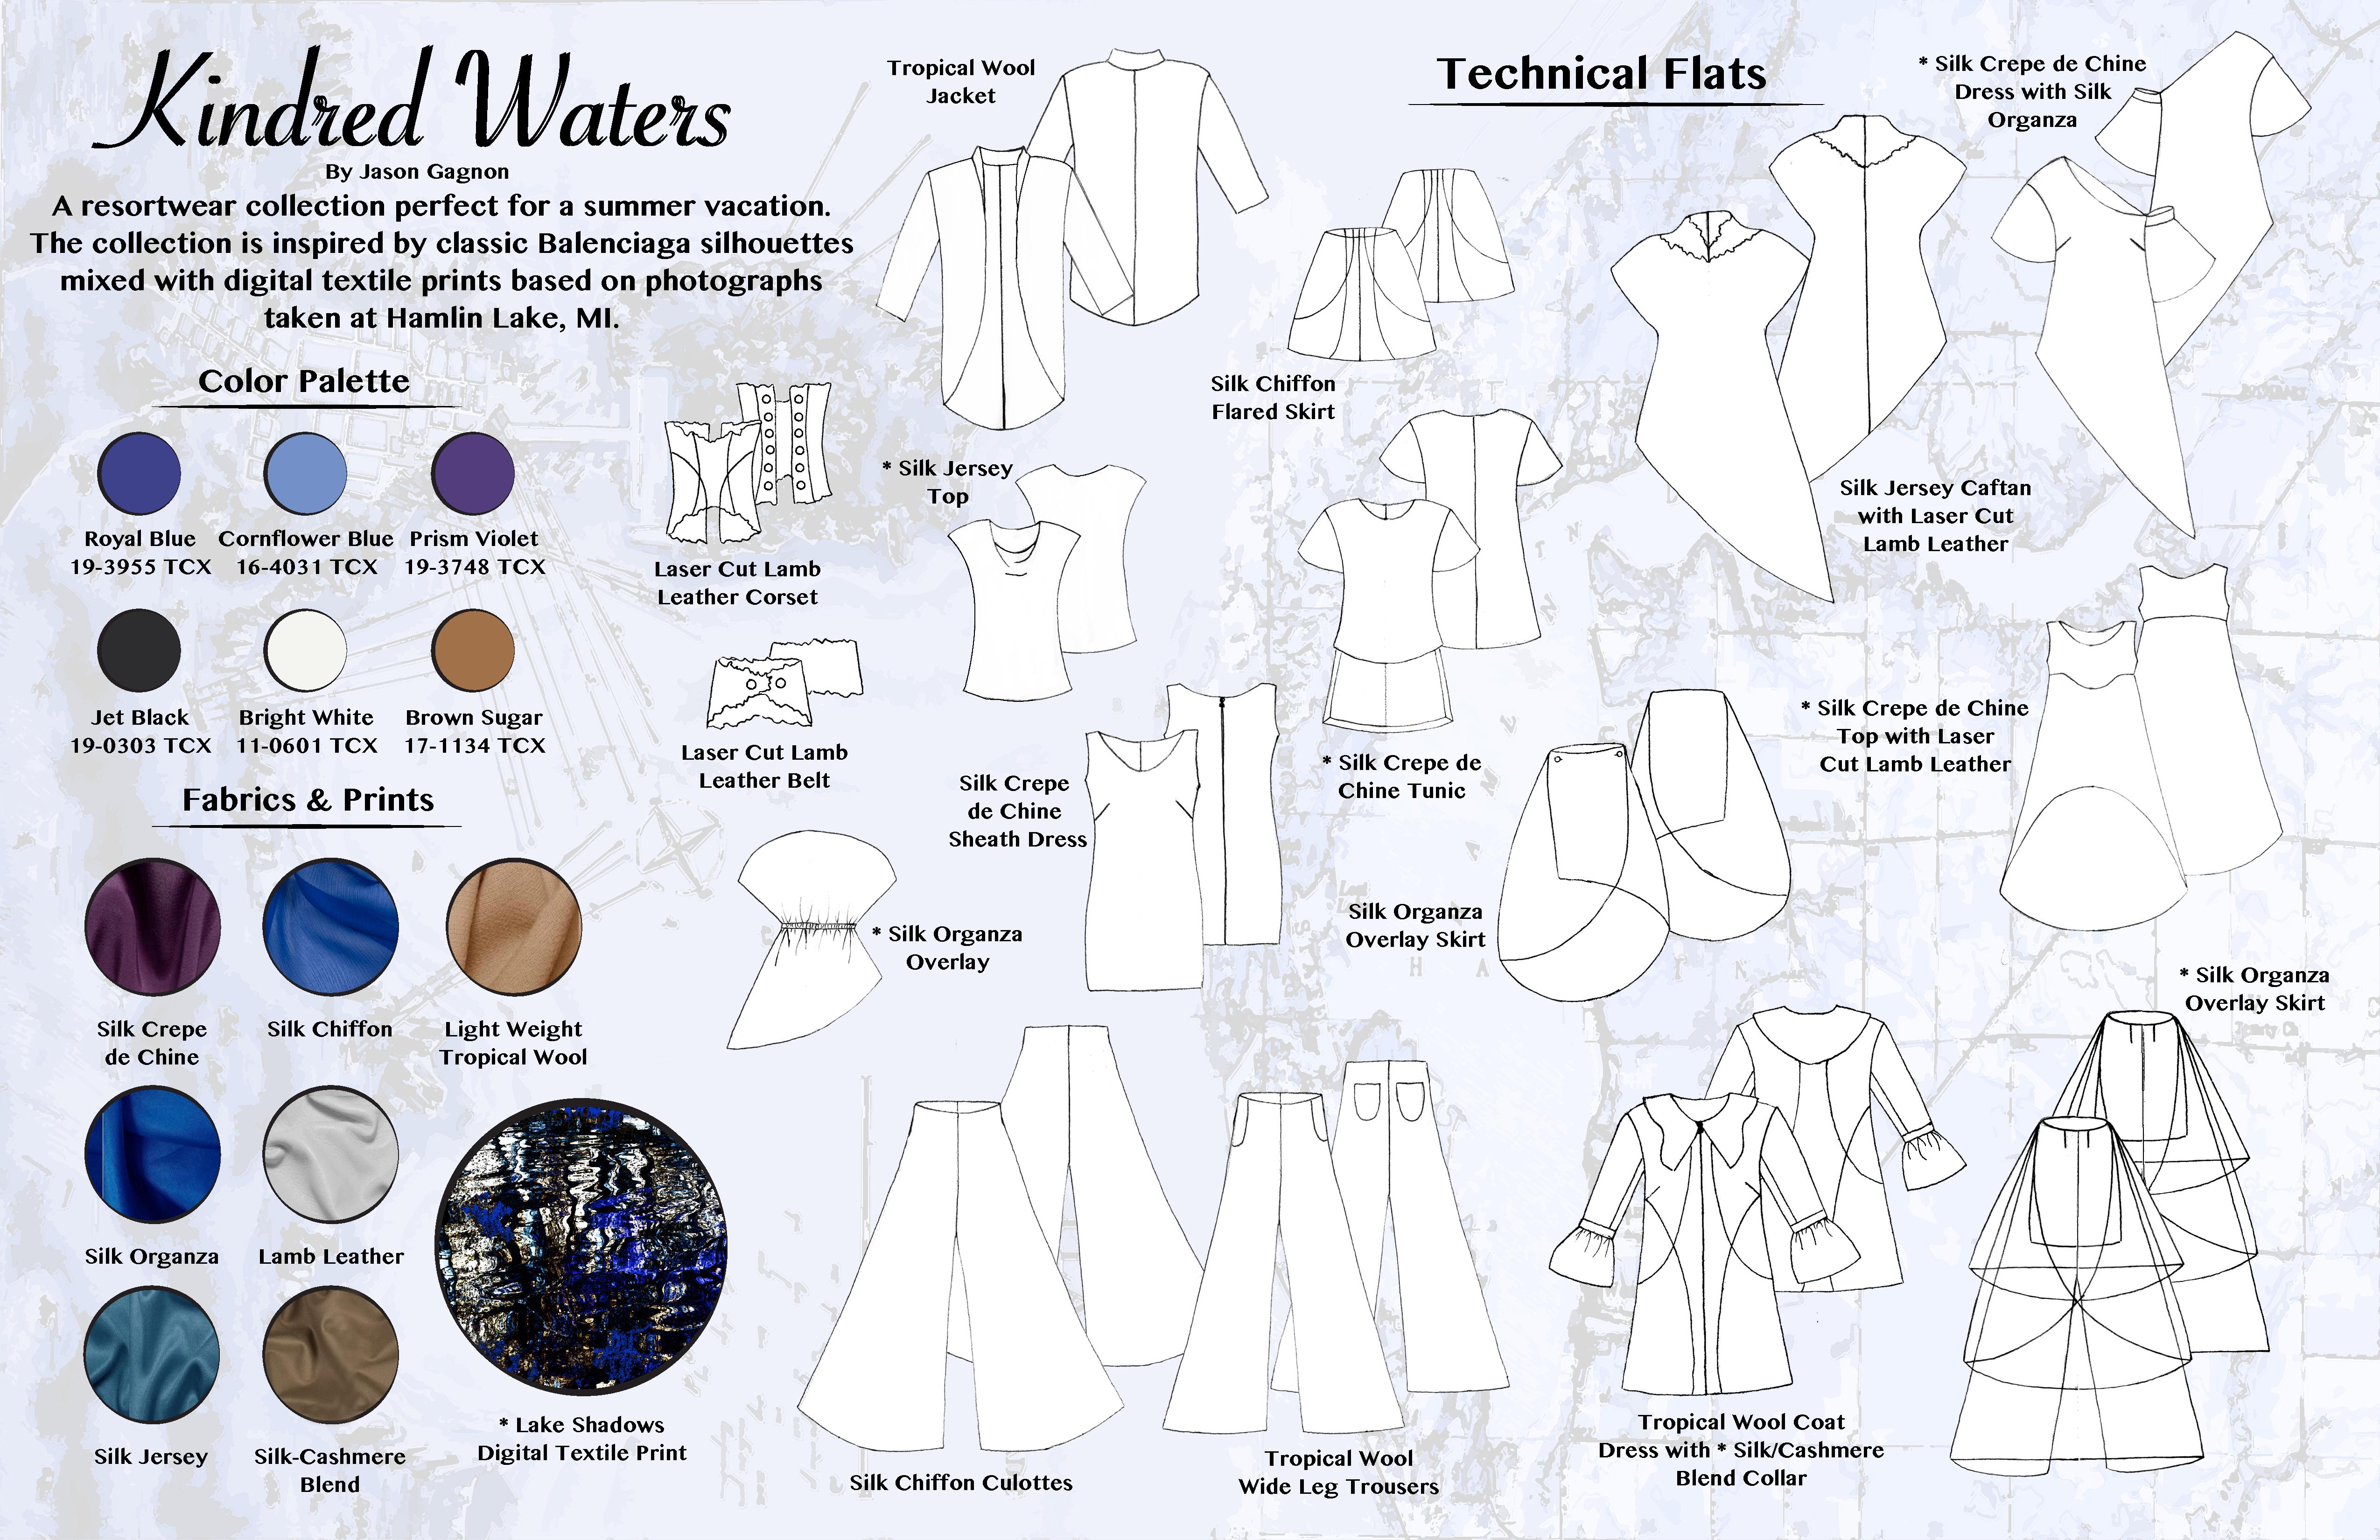 Technical Flats & Details